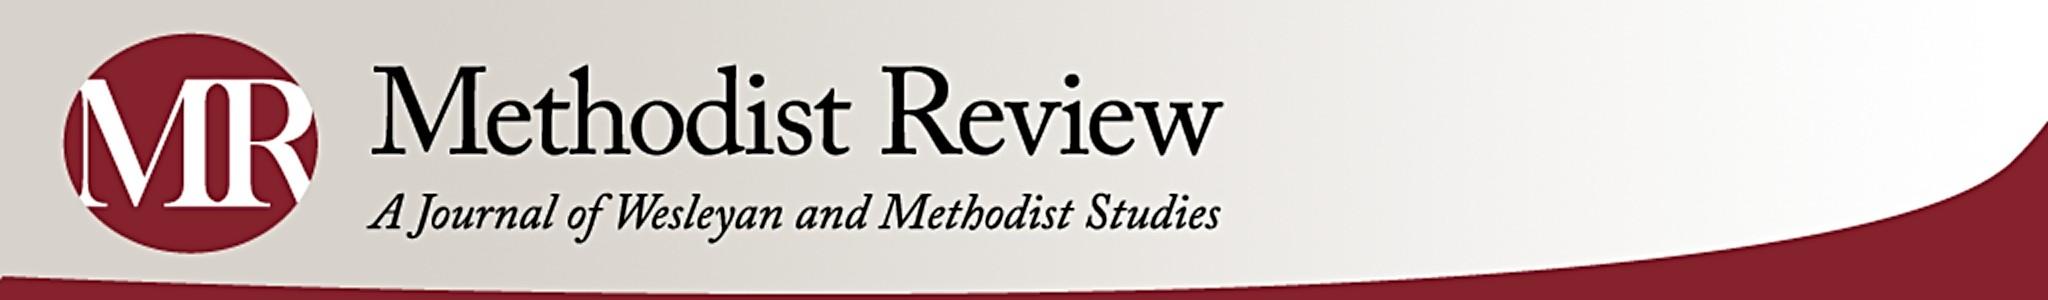 Logo for Methodist Review: A Journal of Wesleyan and Methodist Studies